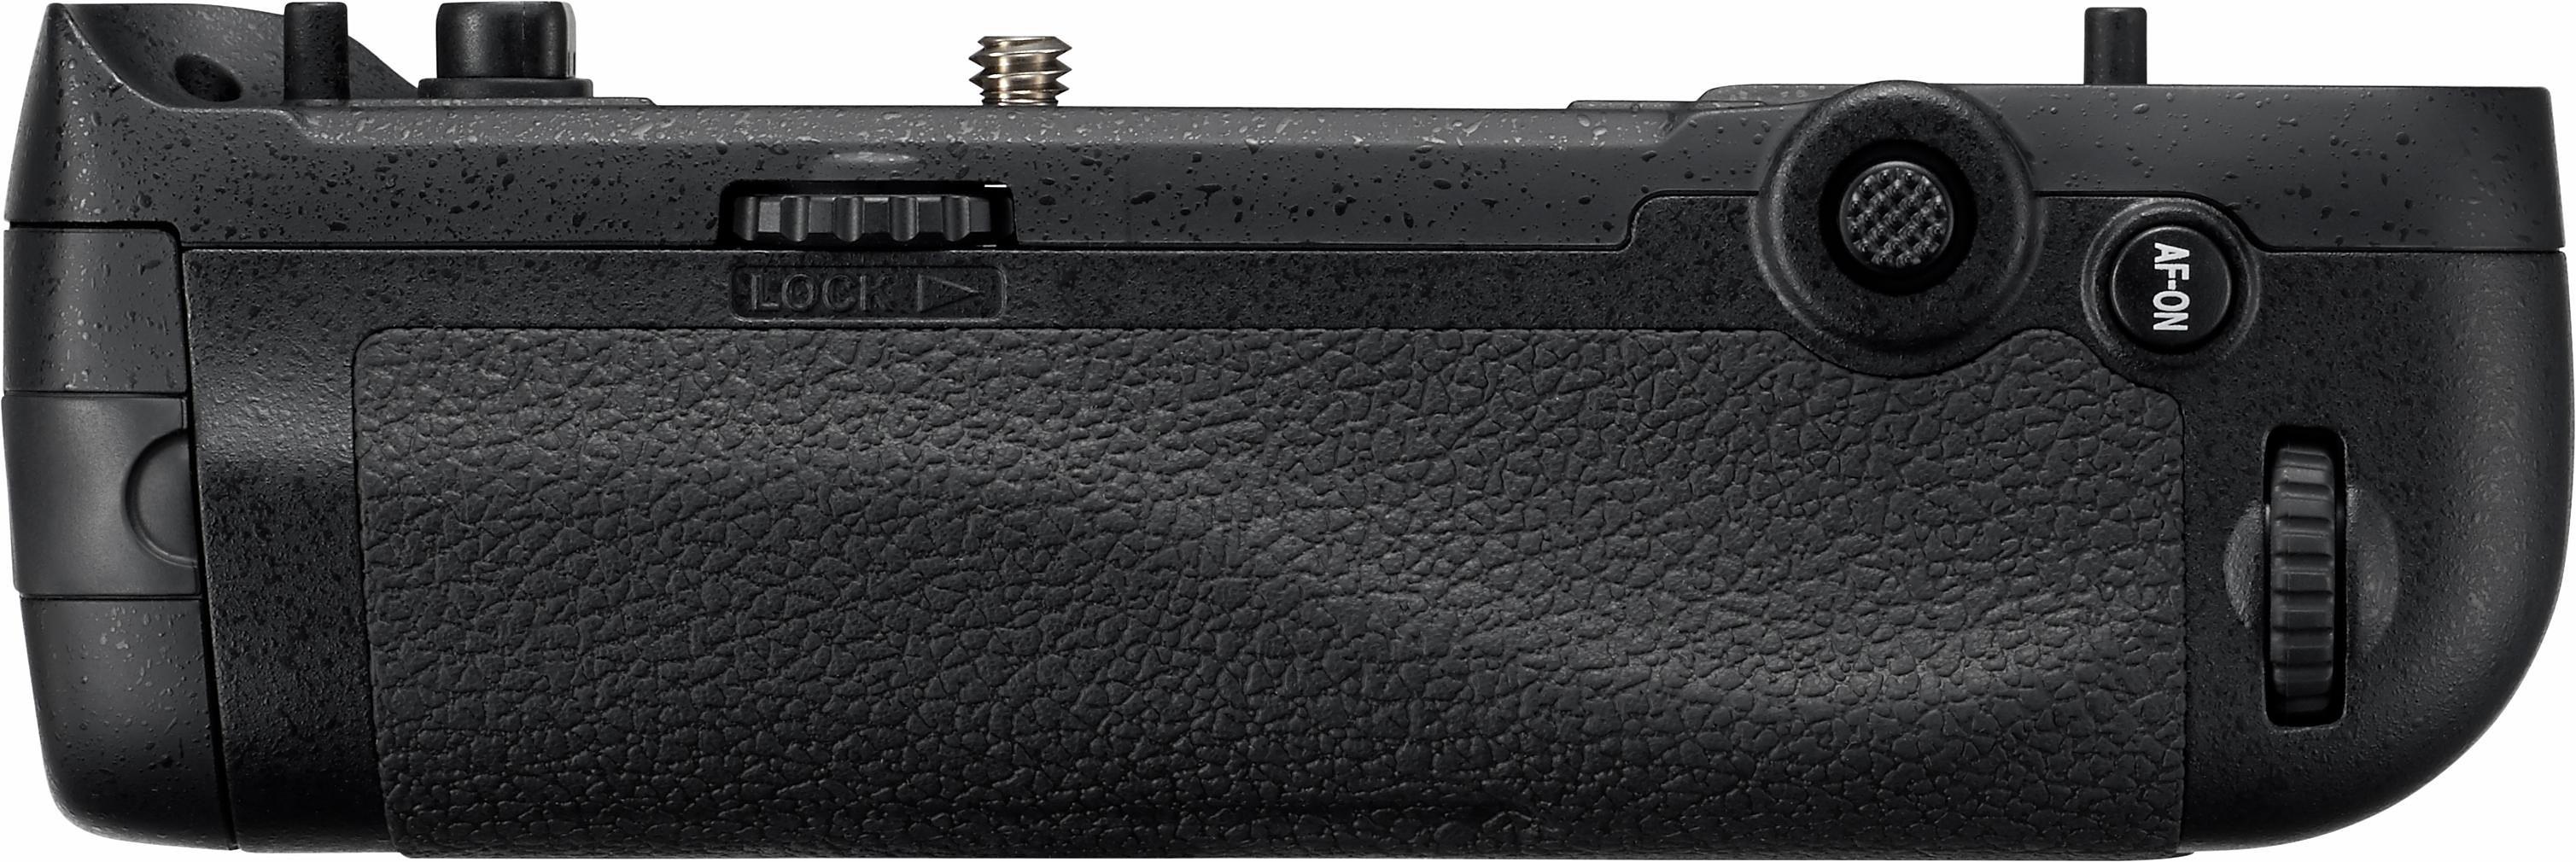 Nikon MB-D17 Handgriff